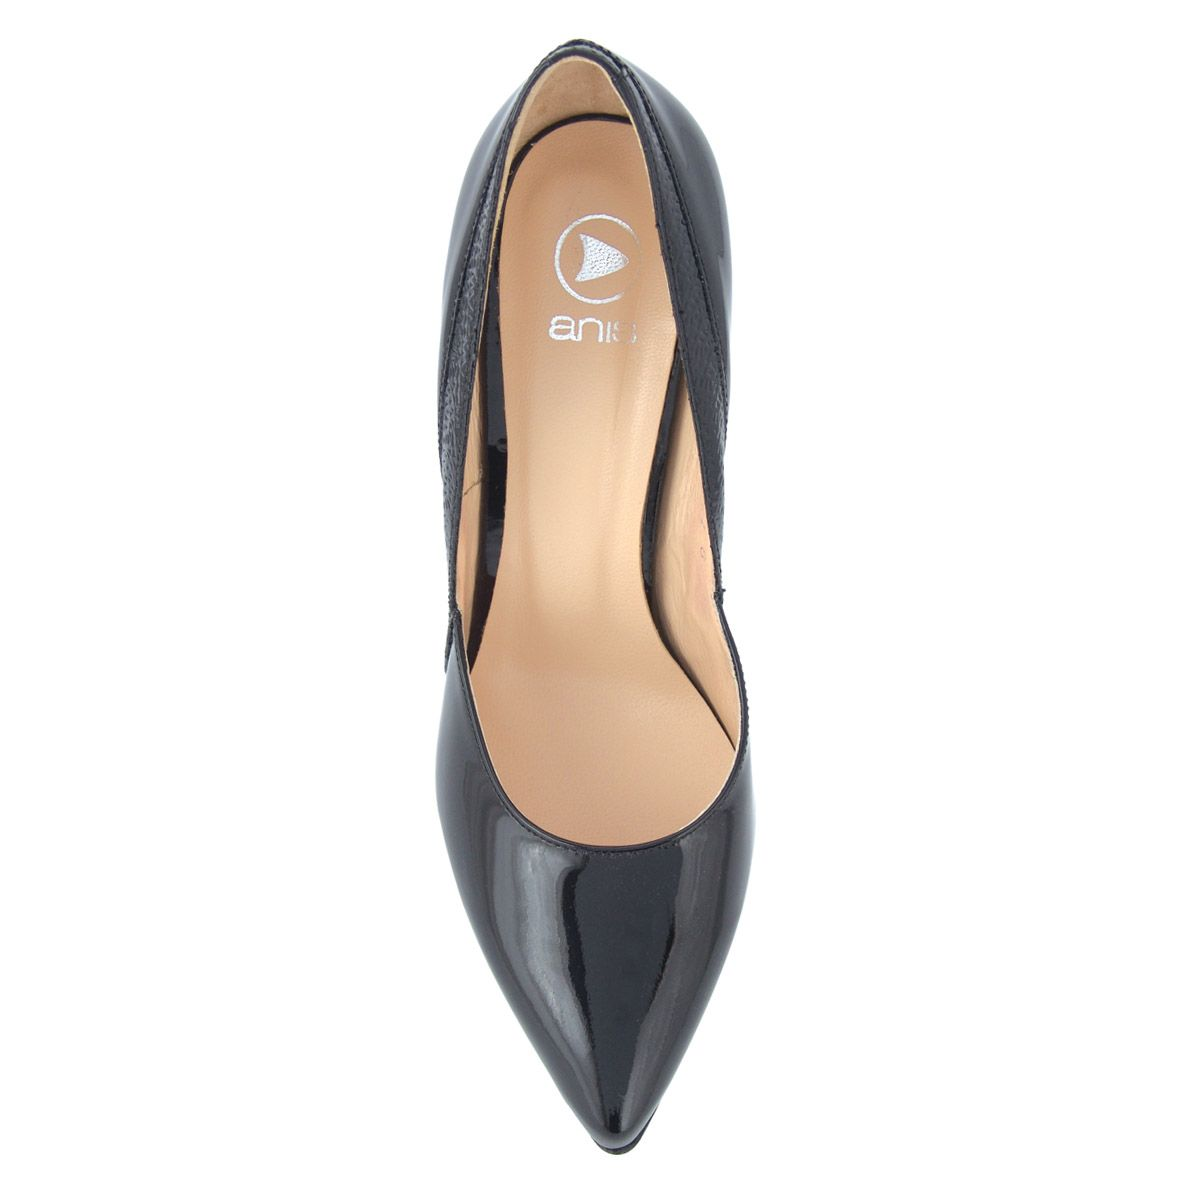 Anis alkalmi cipő - Lakk magas sarkú női cipő  c9fe0afb6a